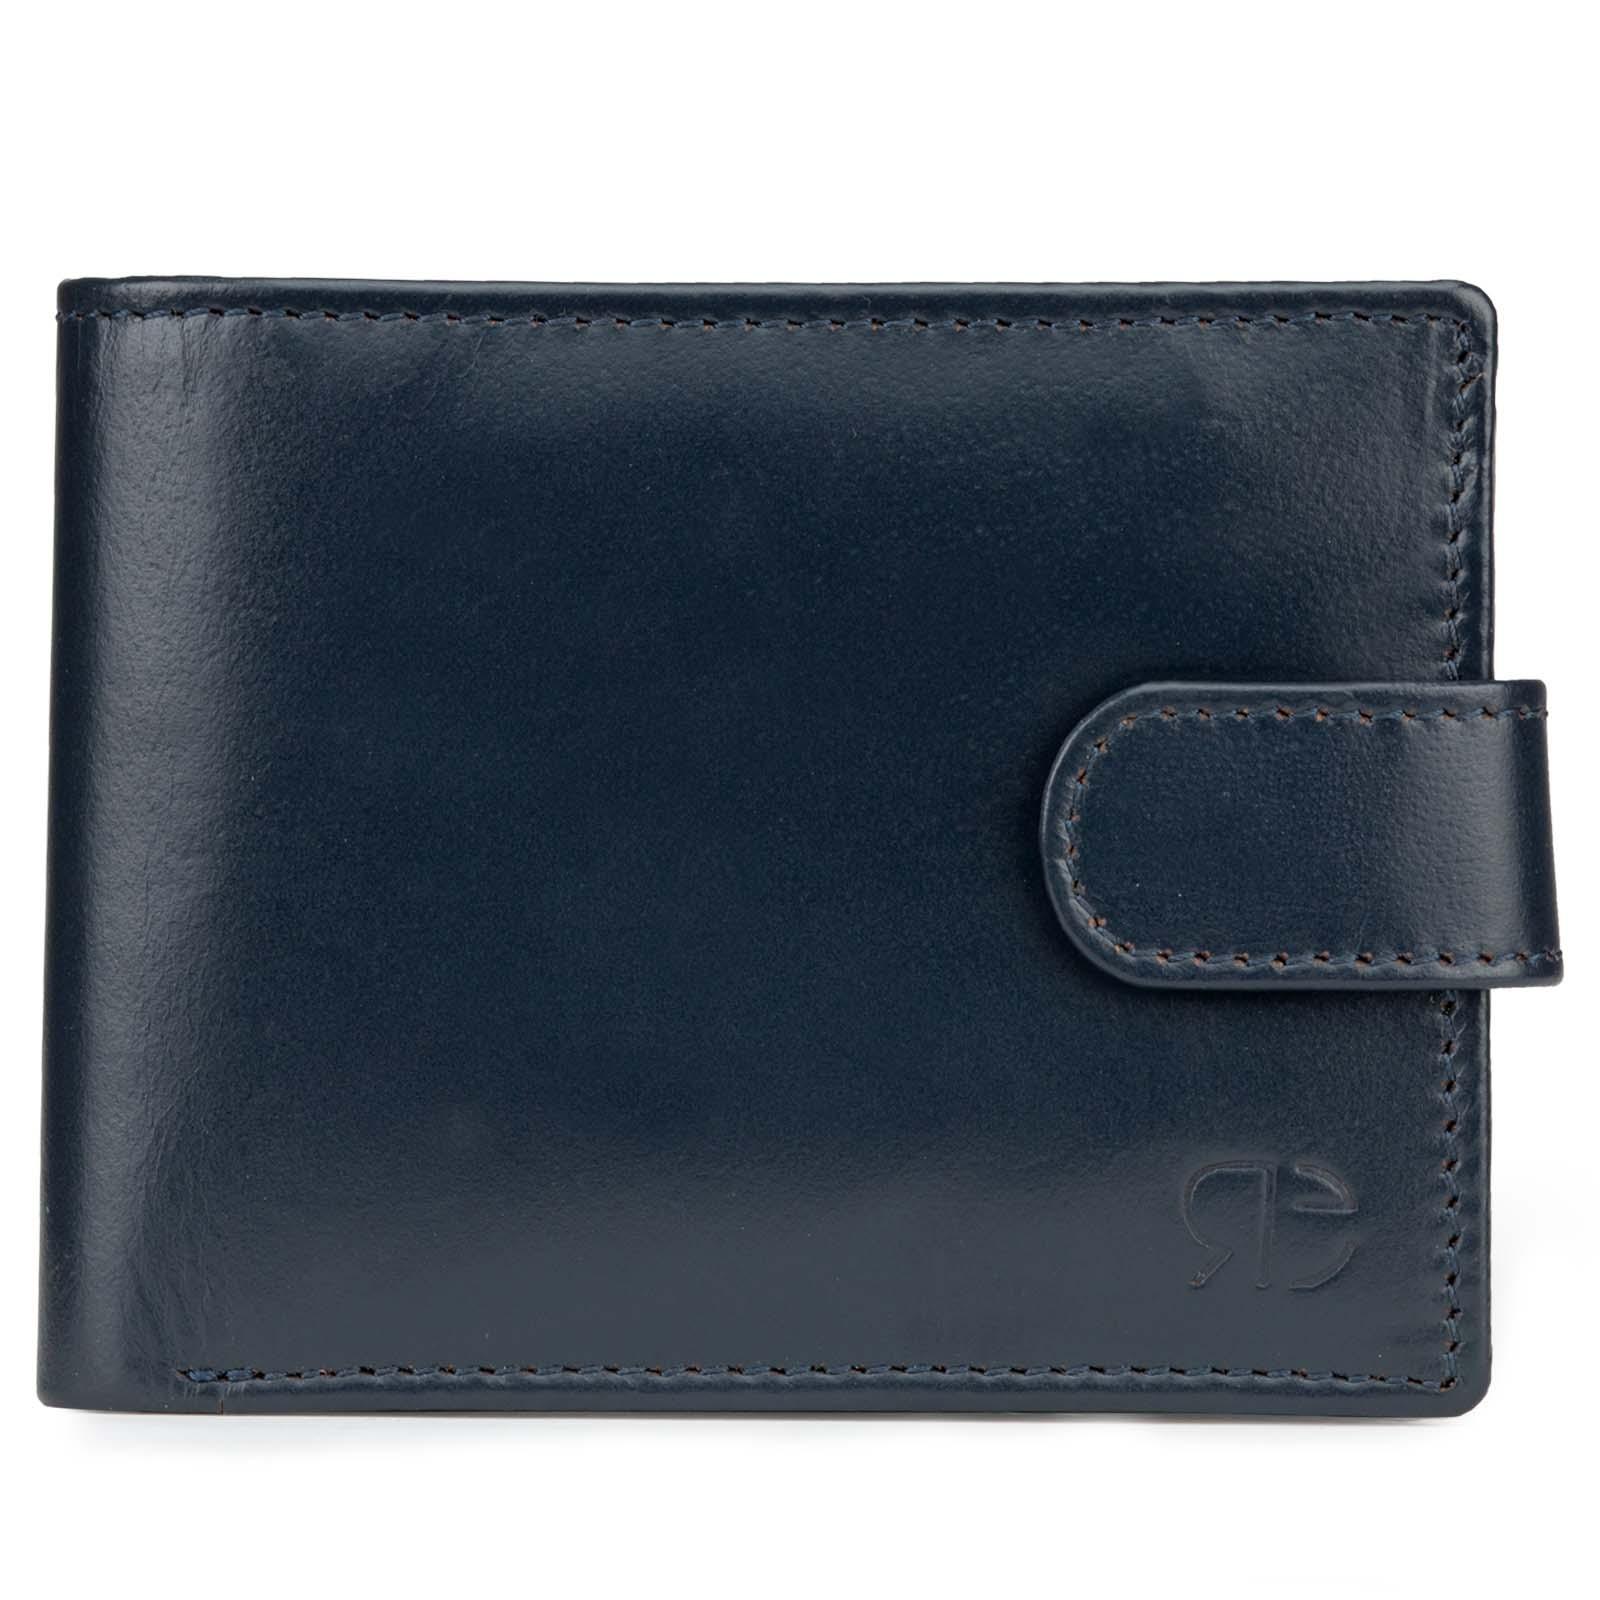 Blue Plain Leather Mens Wallet with Flap Button Closure